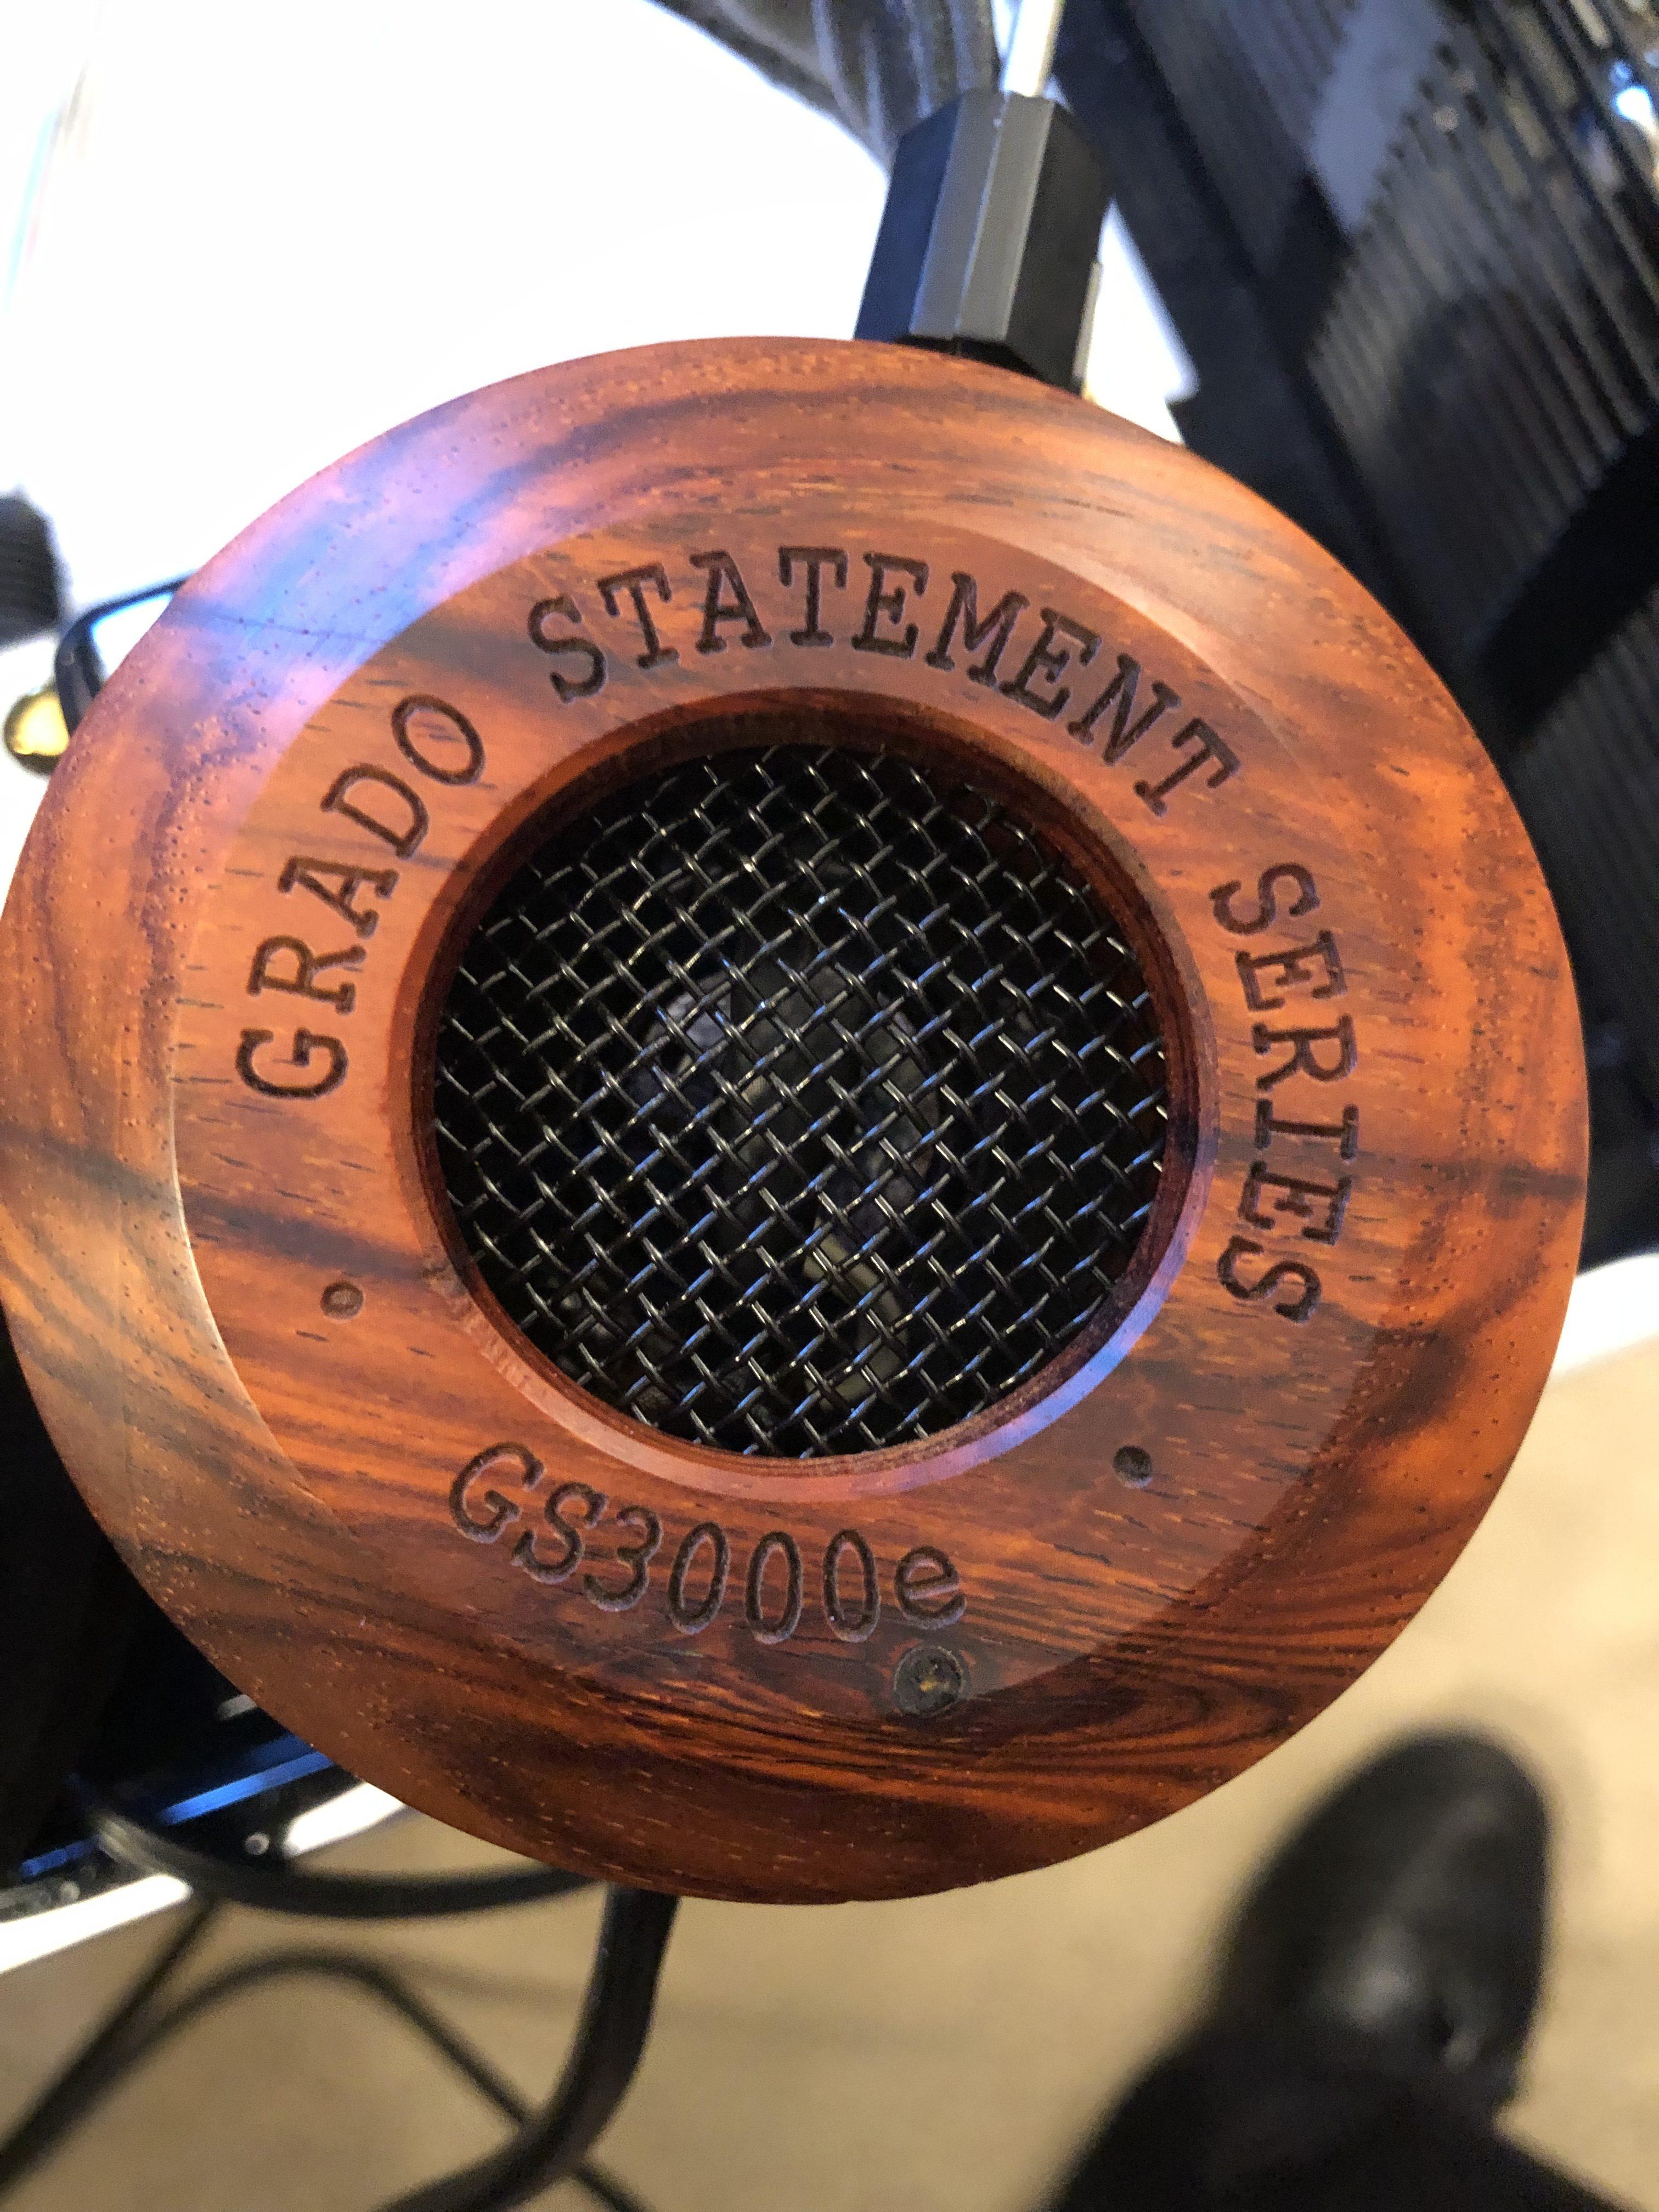 World Premiere Review of Grado Statement GS 3000e Headphones